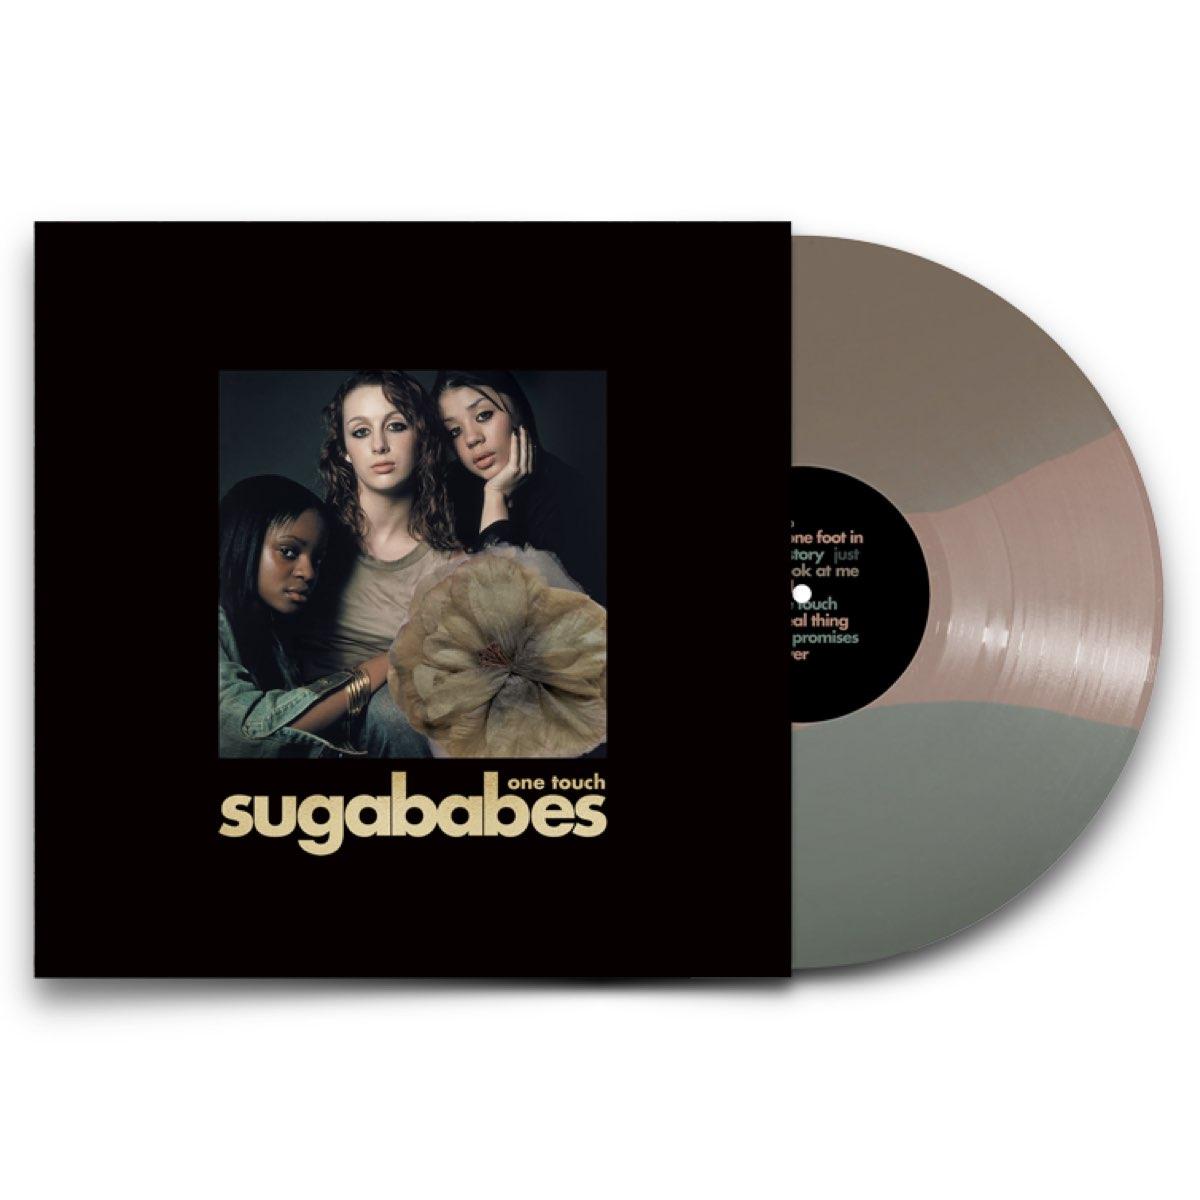 Sugababes - One Touch: Remastered Deluxe LP + Overload CD Single [Autografado e Numerado]